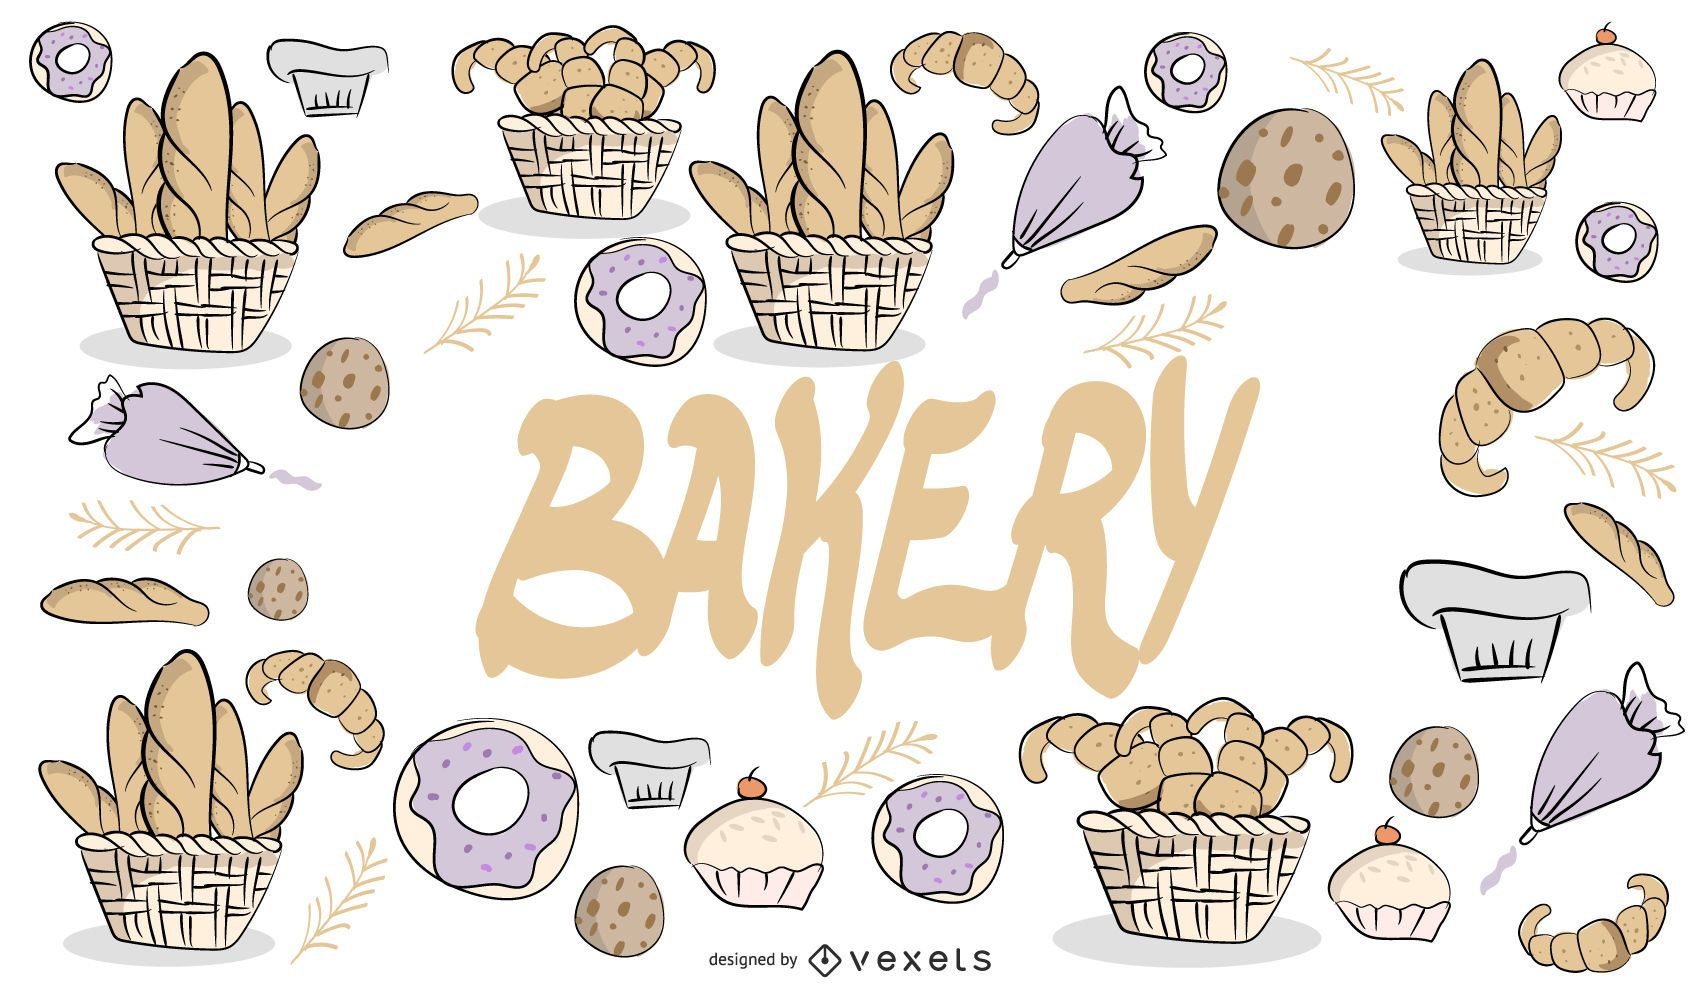 Hand Drawn Bakery Design